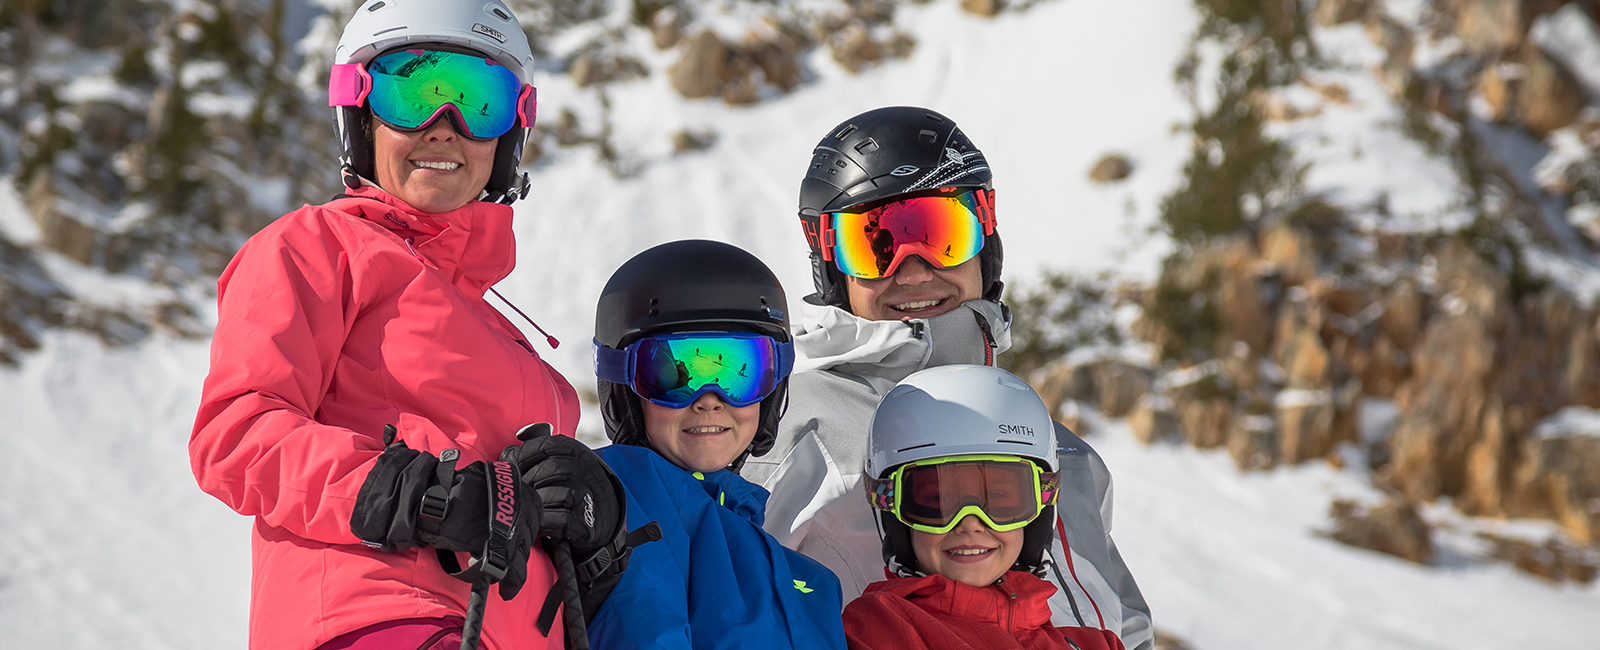 Spring Break & Beyond: Safety Tips for Skiers & Shredders